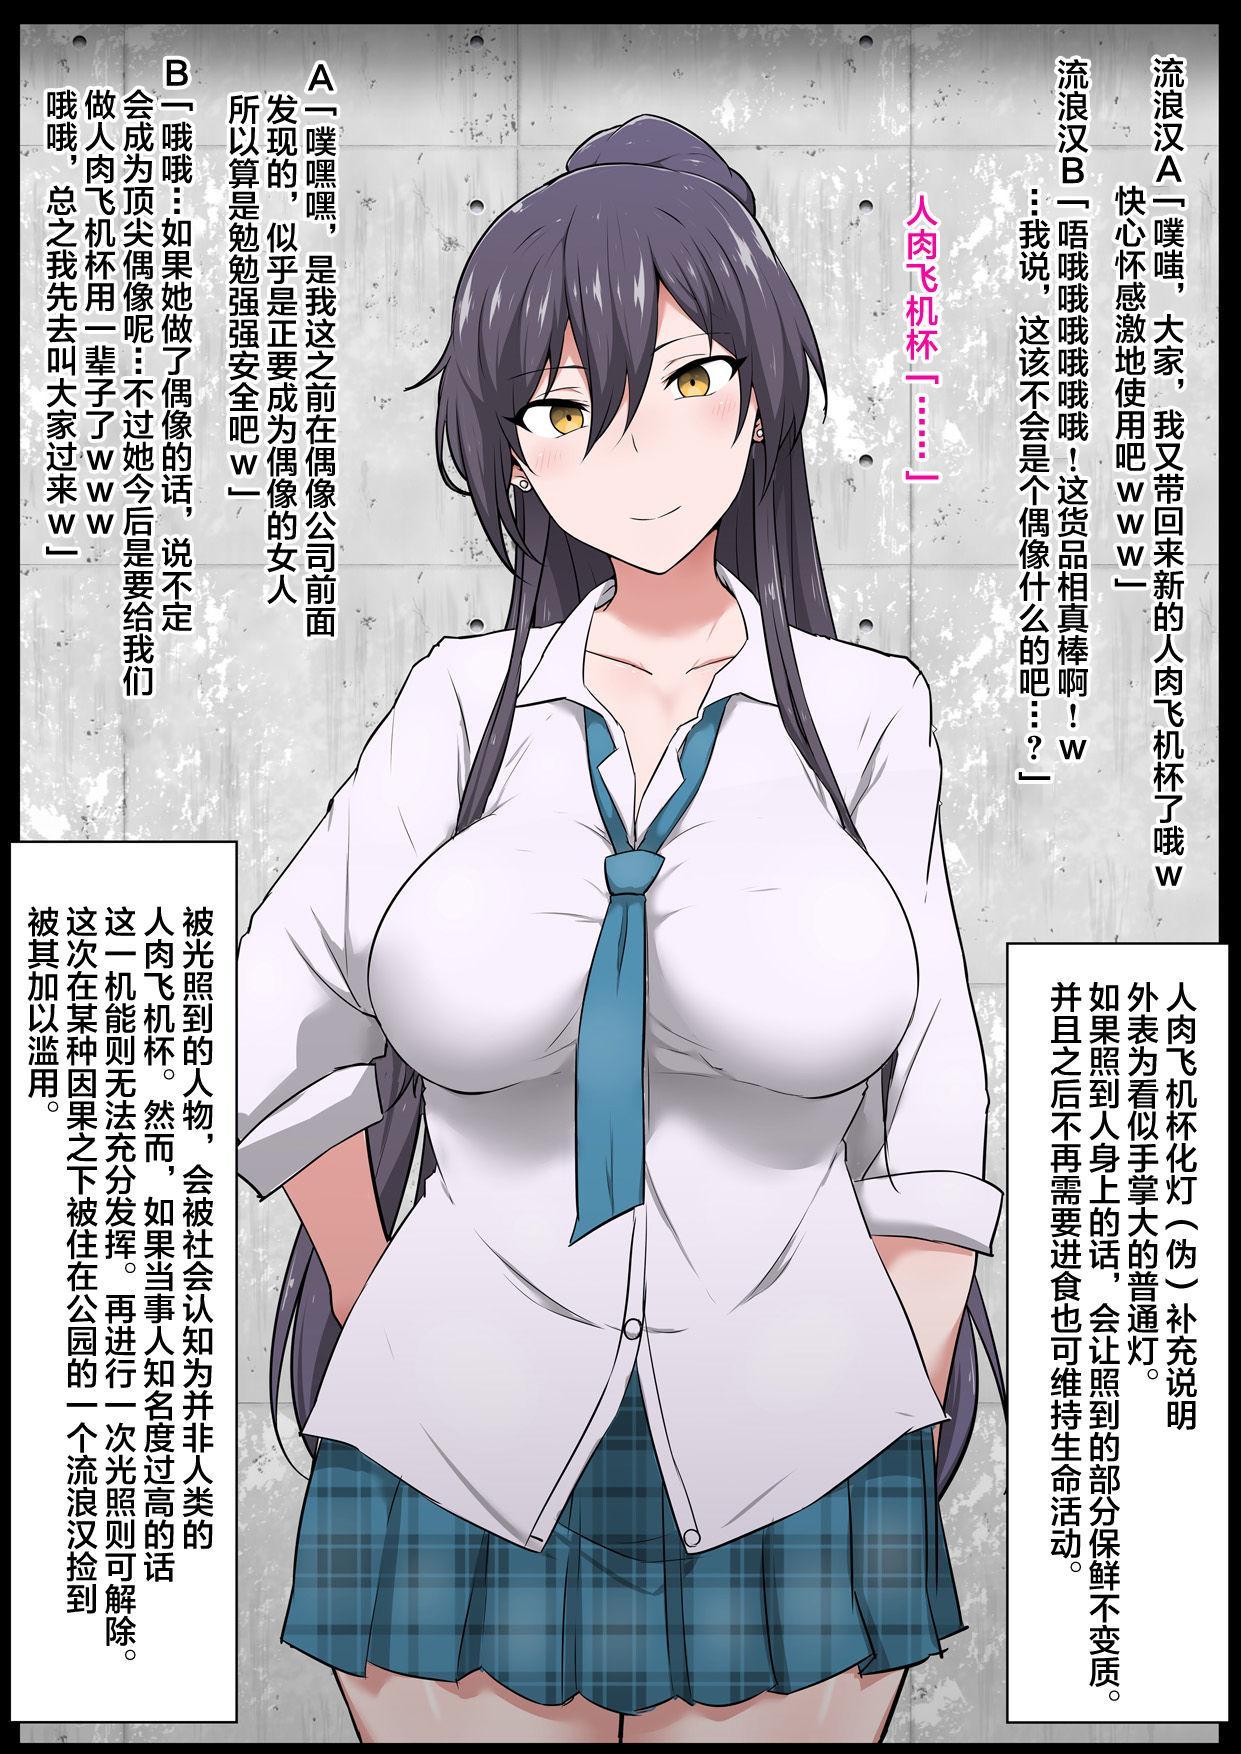 Kurakute Semai Seihekisho Vol. 2 Saimin Sennou 13